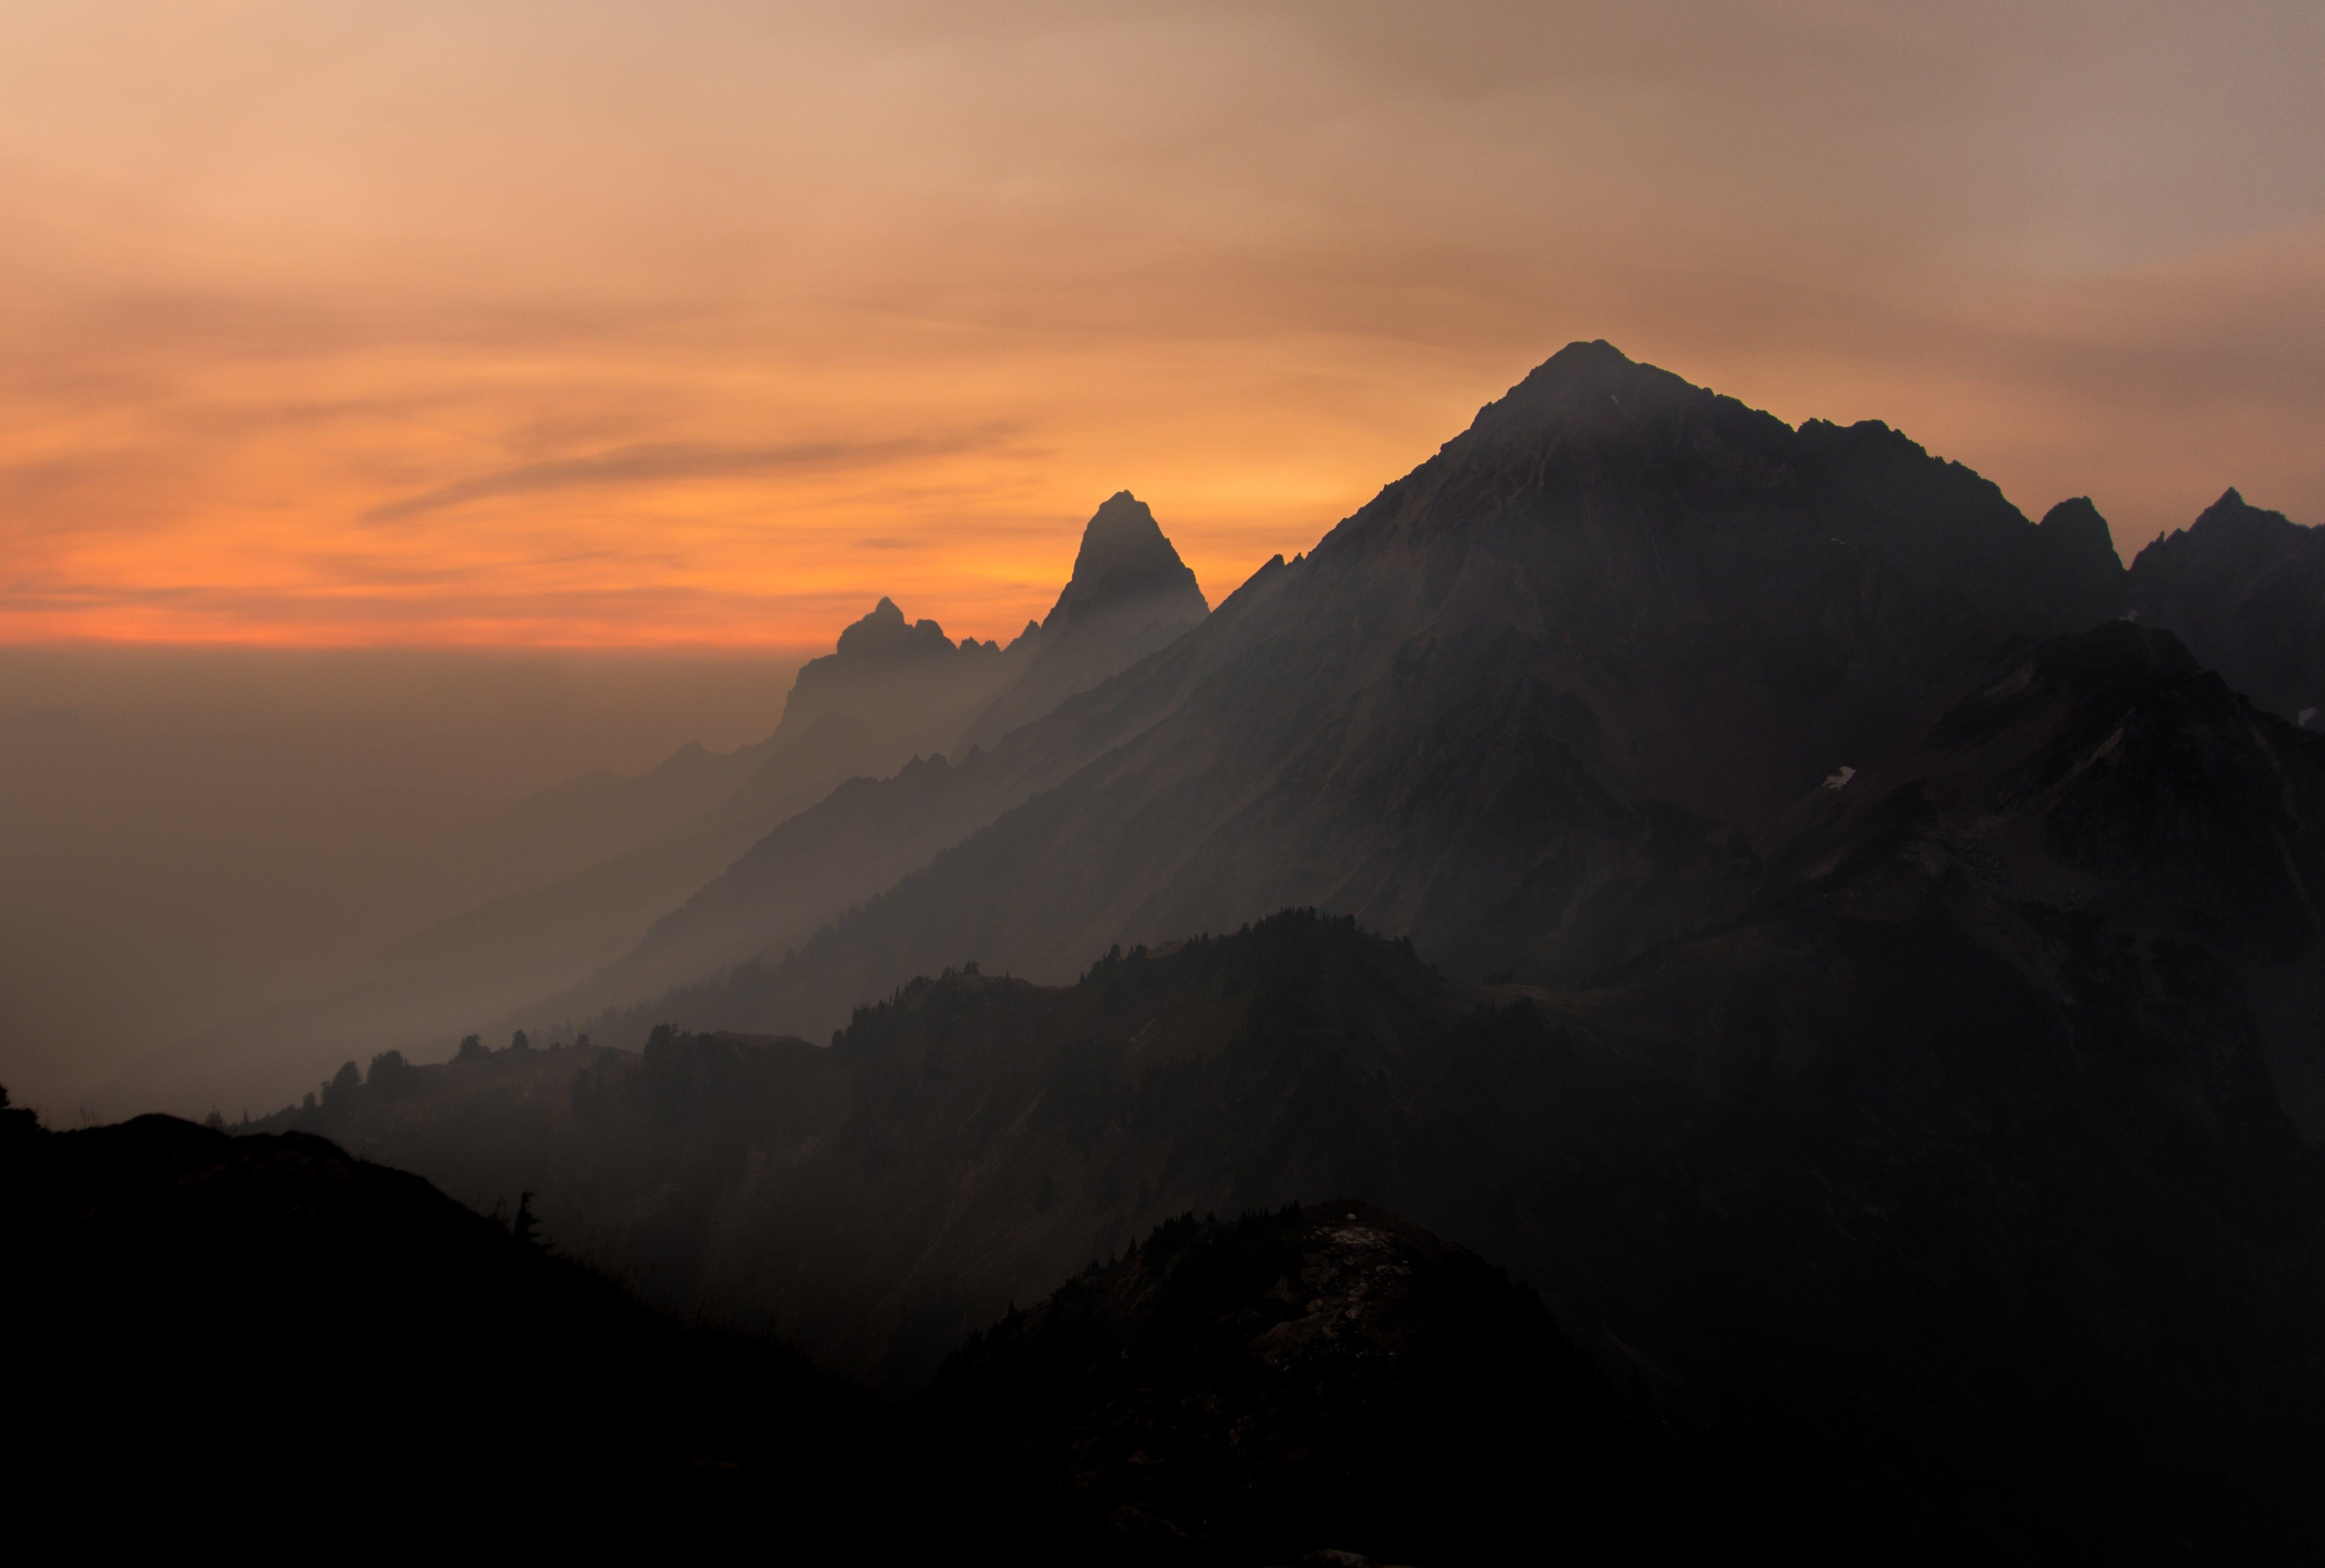 Free stock photo of landscape, nature, sunset, mountain